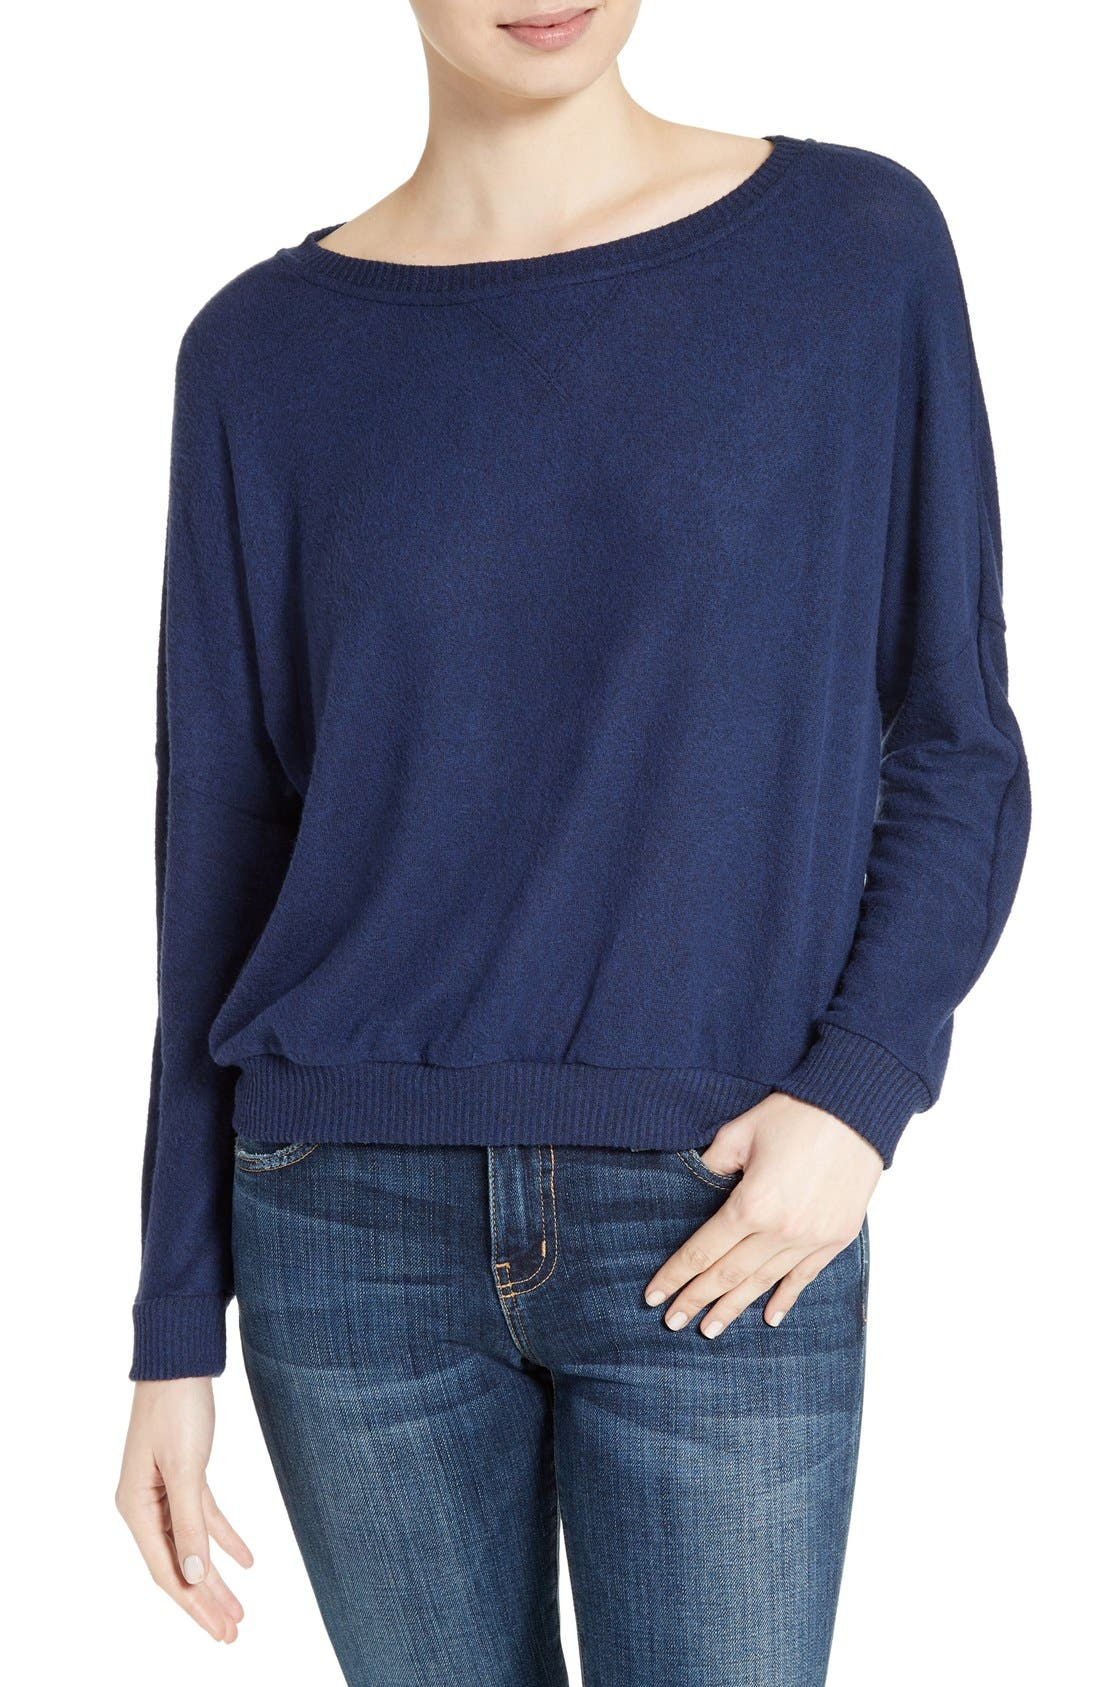 Alternate Image 1 Selected - Soft Joie Giardia Drop Shoulder Sweater